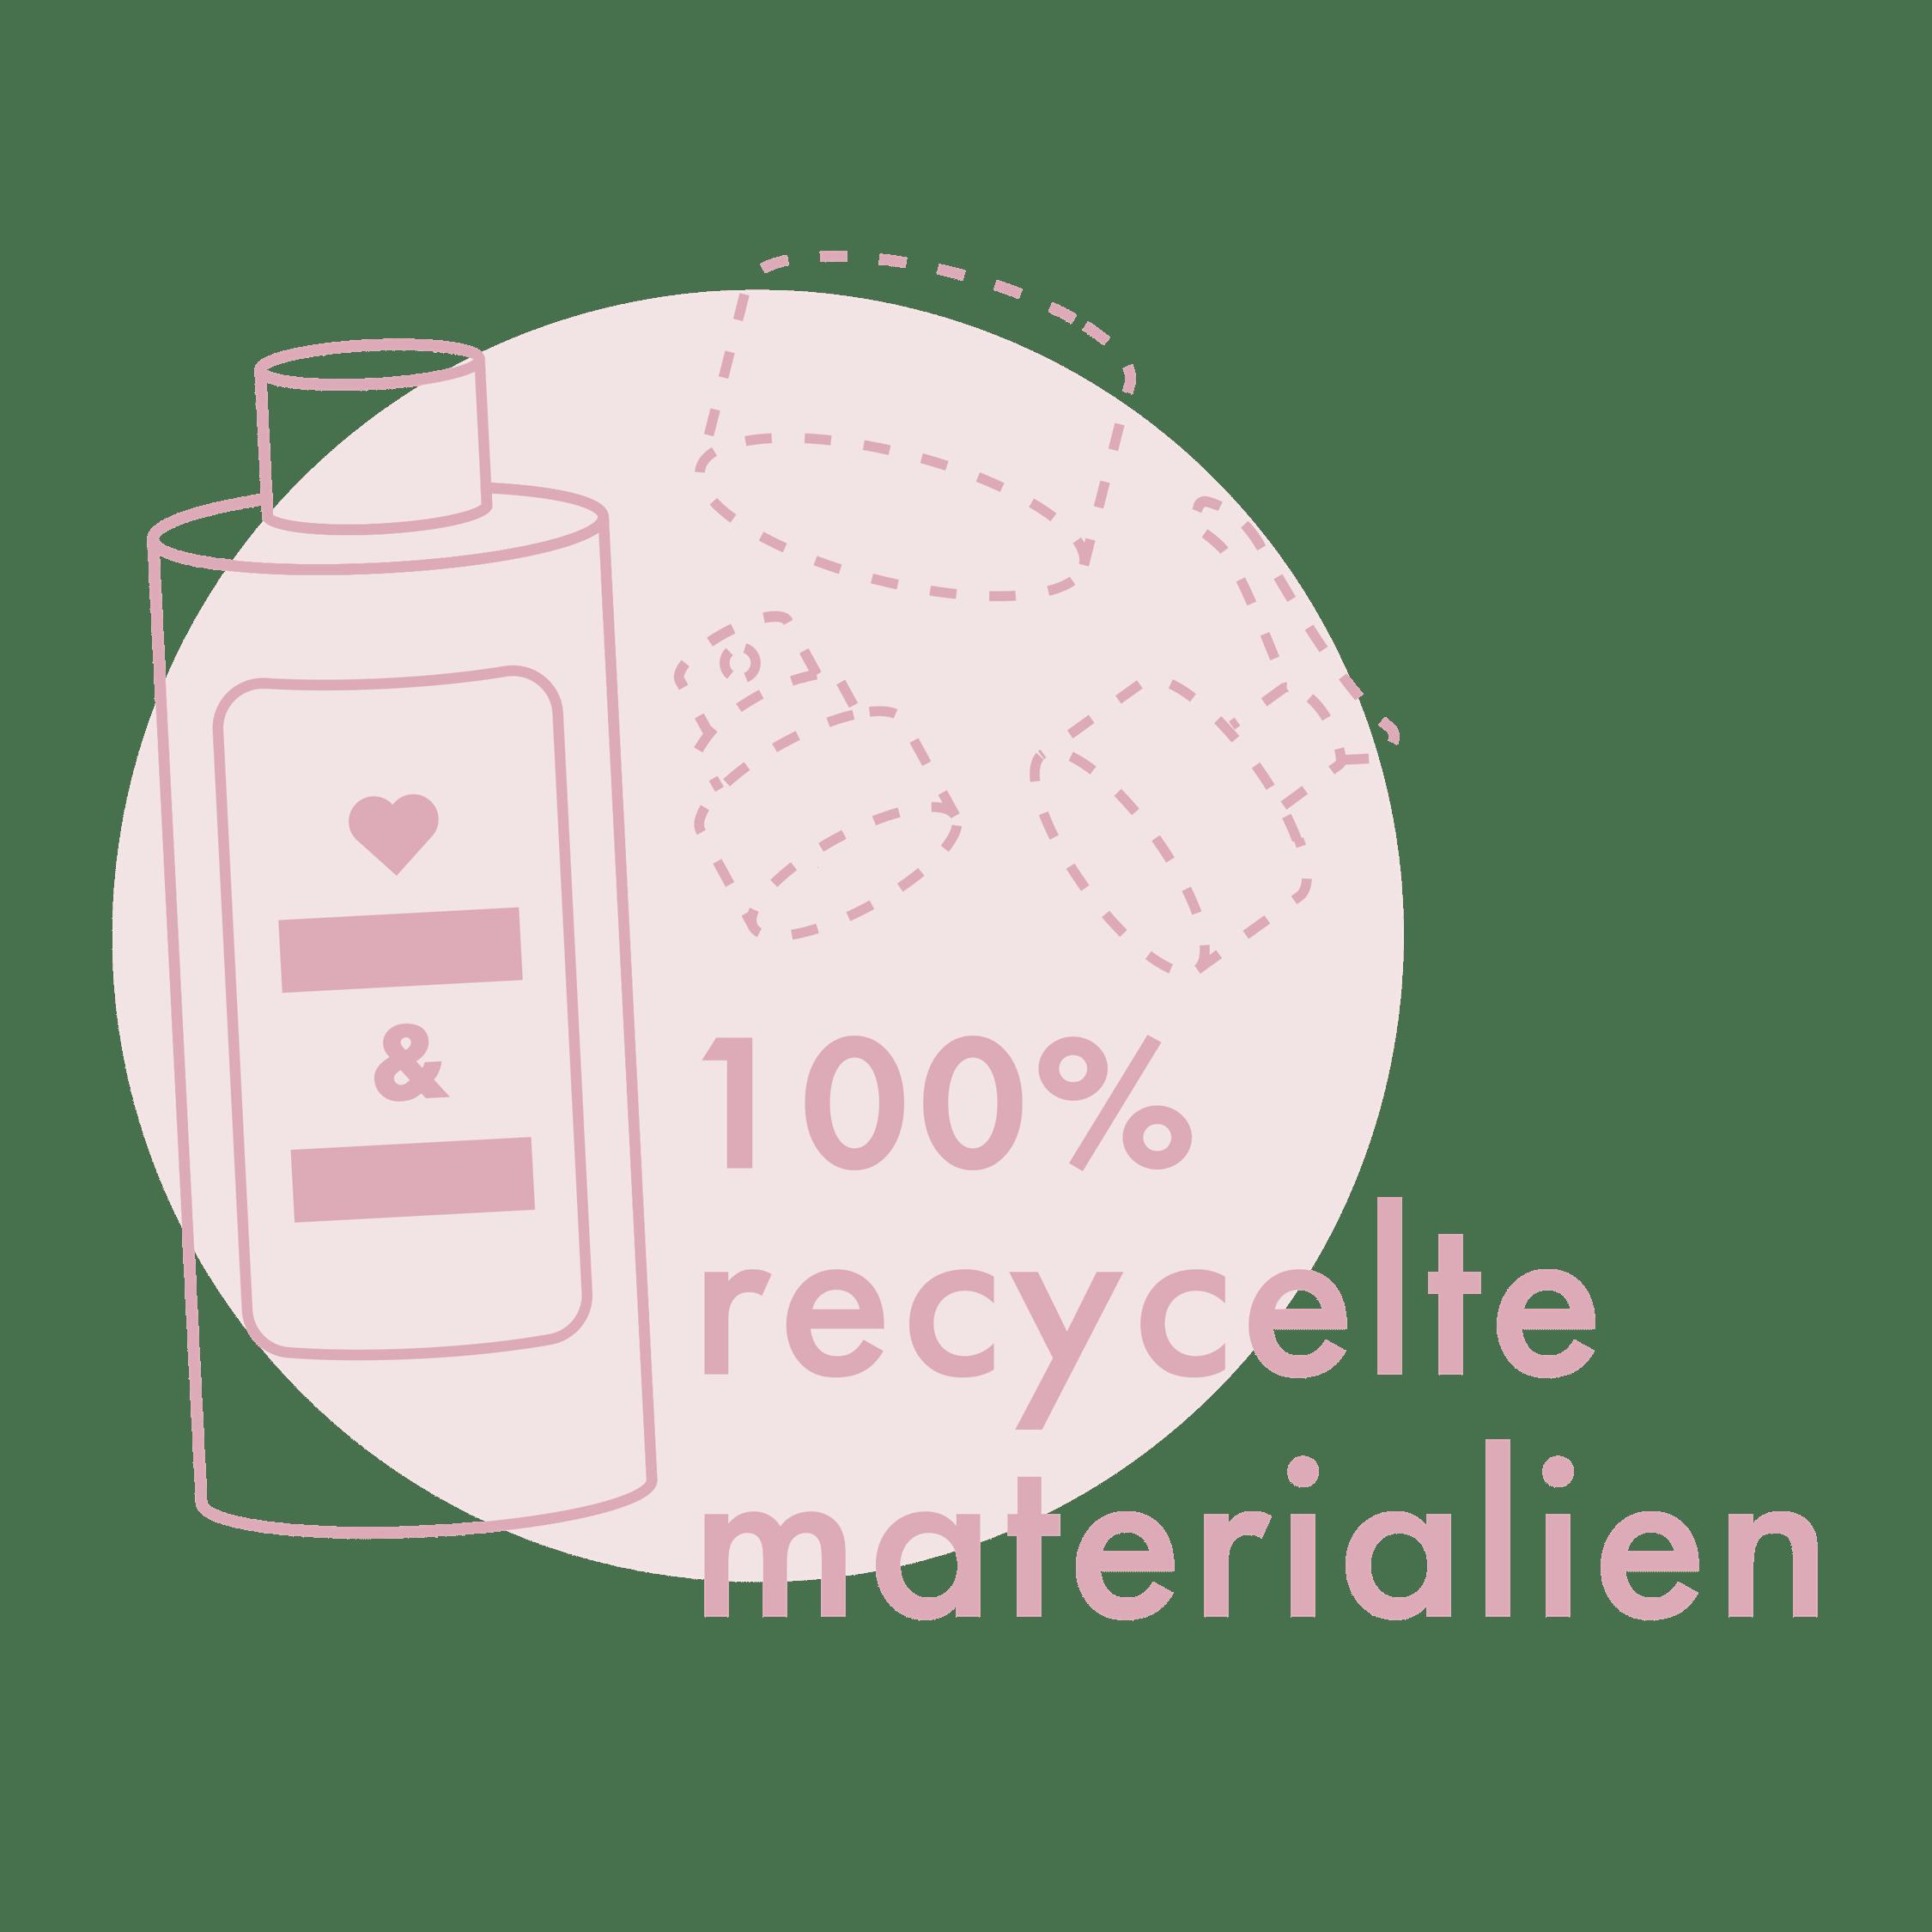 Unilever Friends - 100% recycelte Materialien